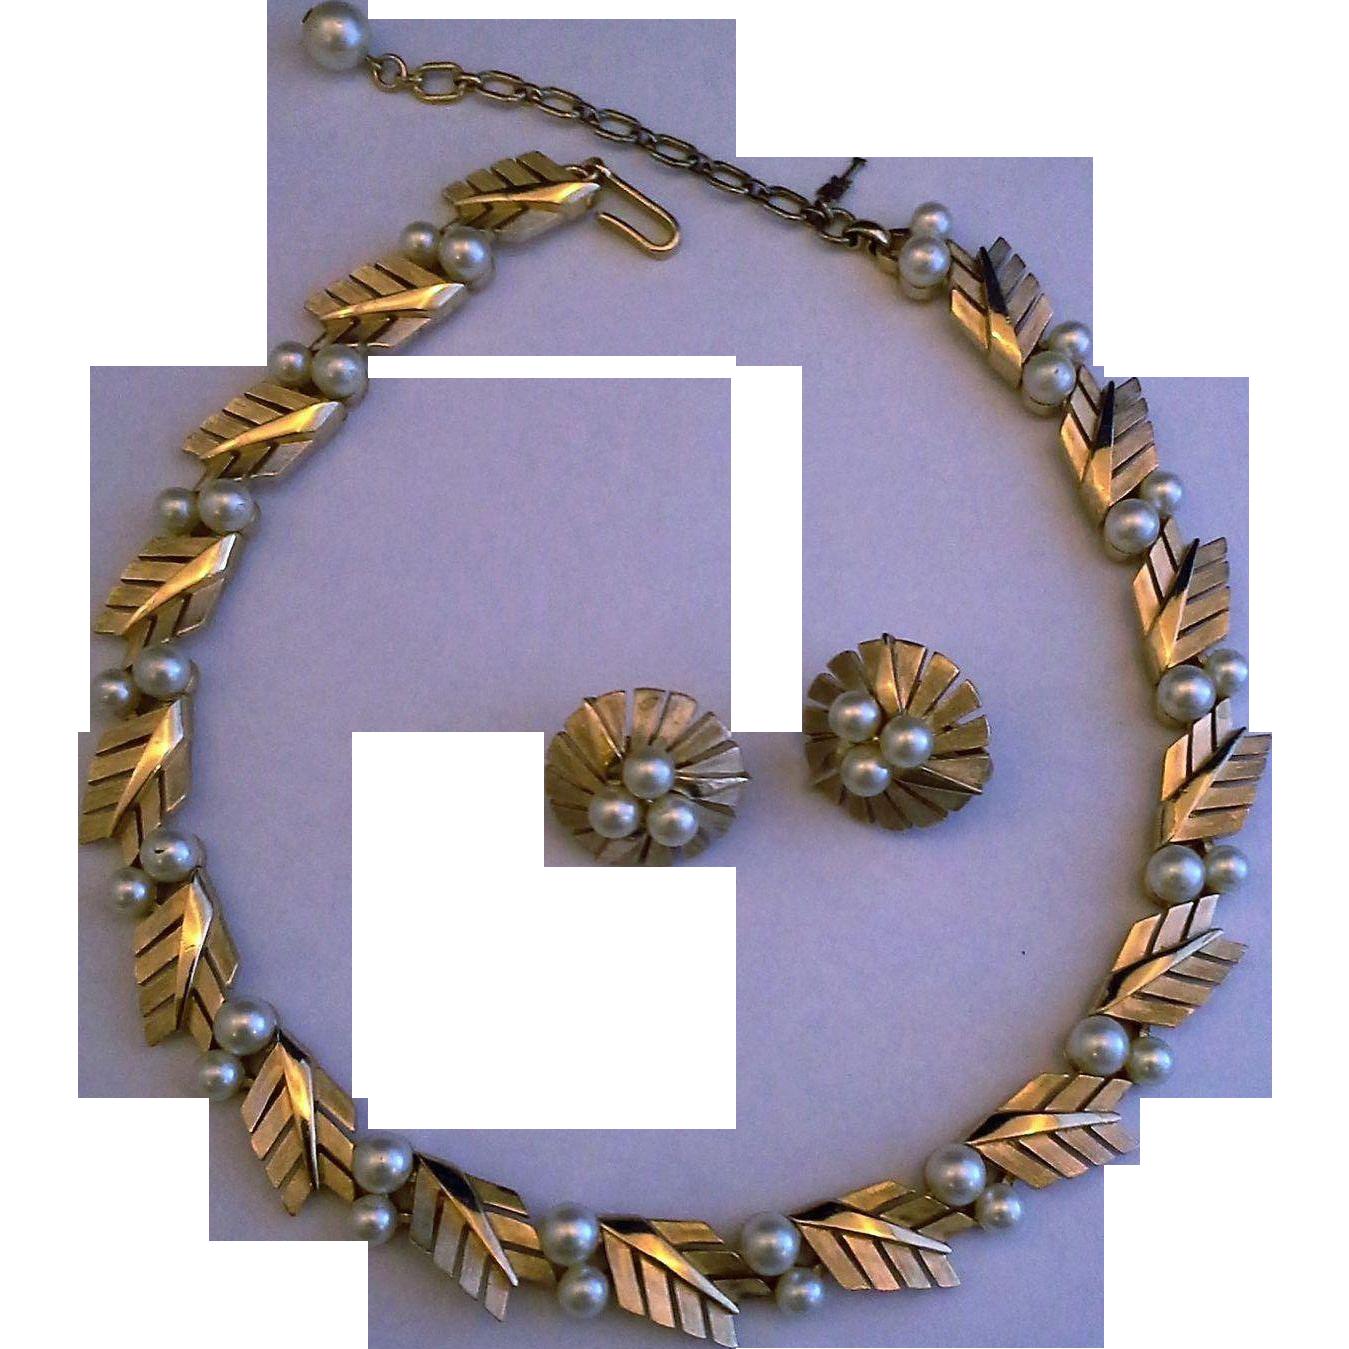 Crown Trifari Brushed Gold Tone Faux Pearls Fern Leaf Links Necklace Choker Earrings Set